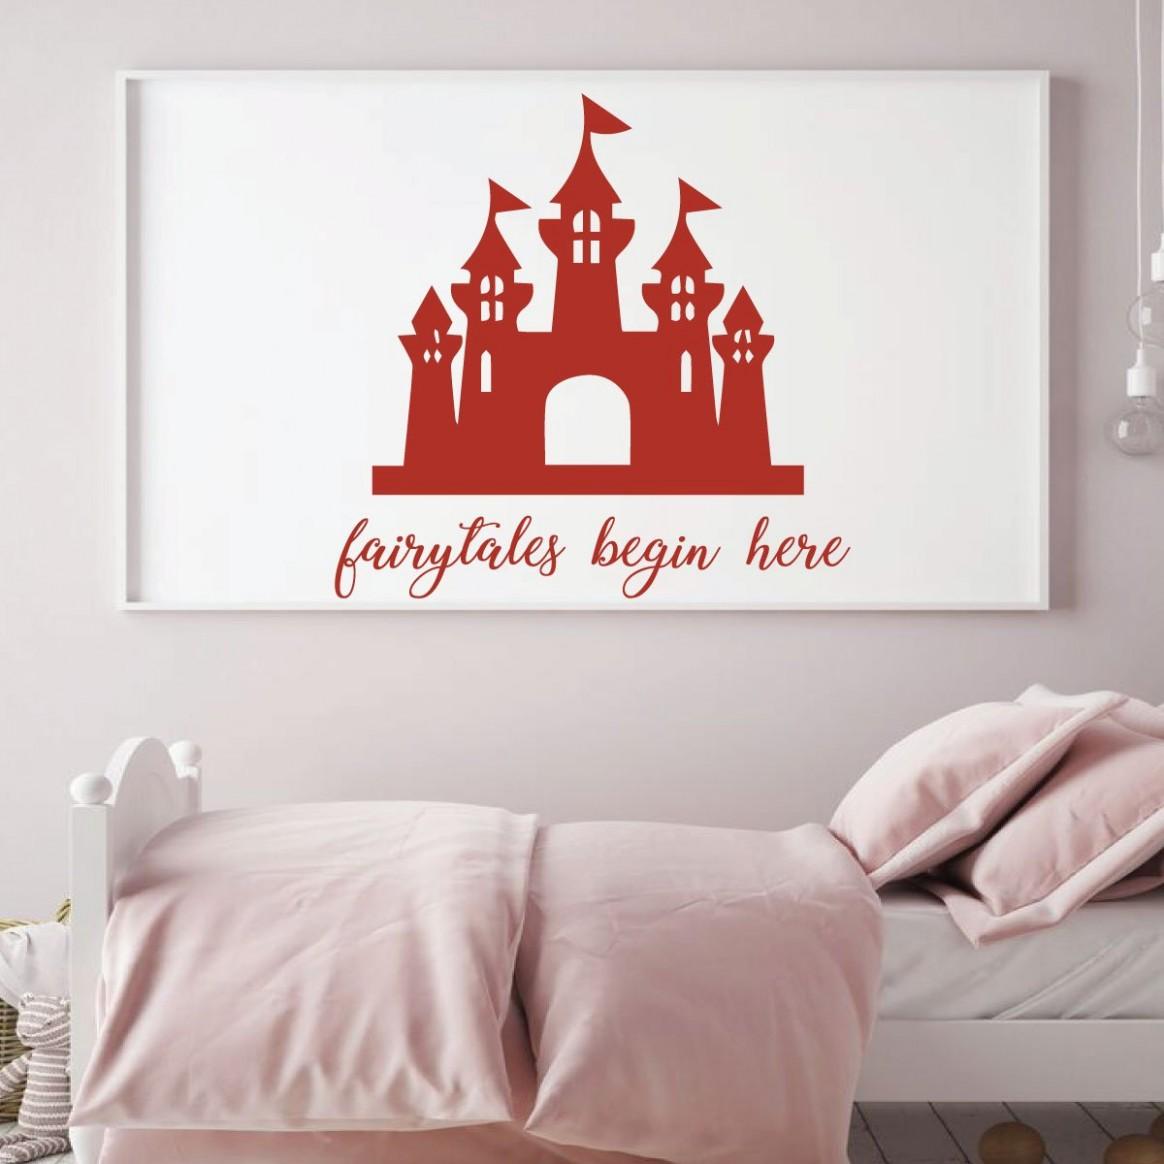 Bedroom Wall Stickers Ideas Ebay Uk Amazon India Decor Design For  - Bedroom Ideas Ebay